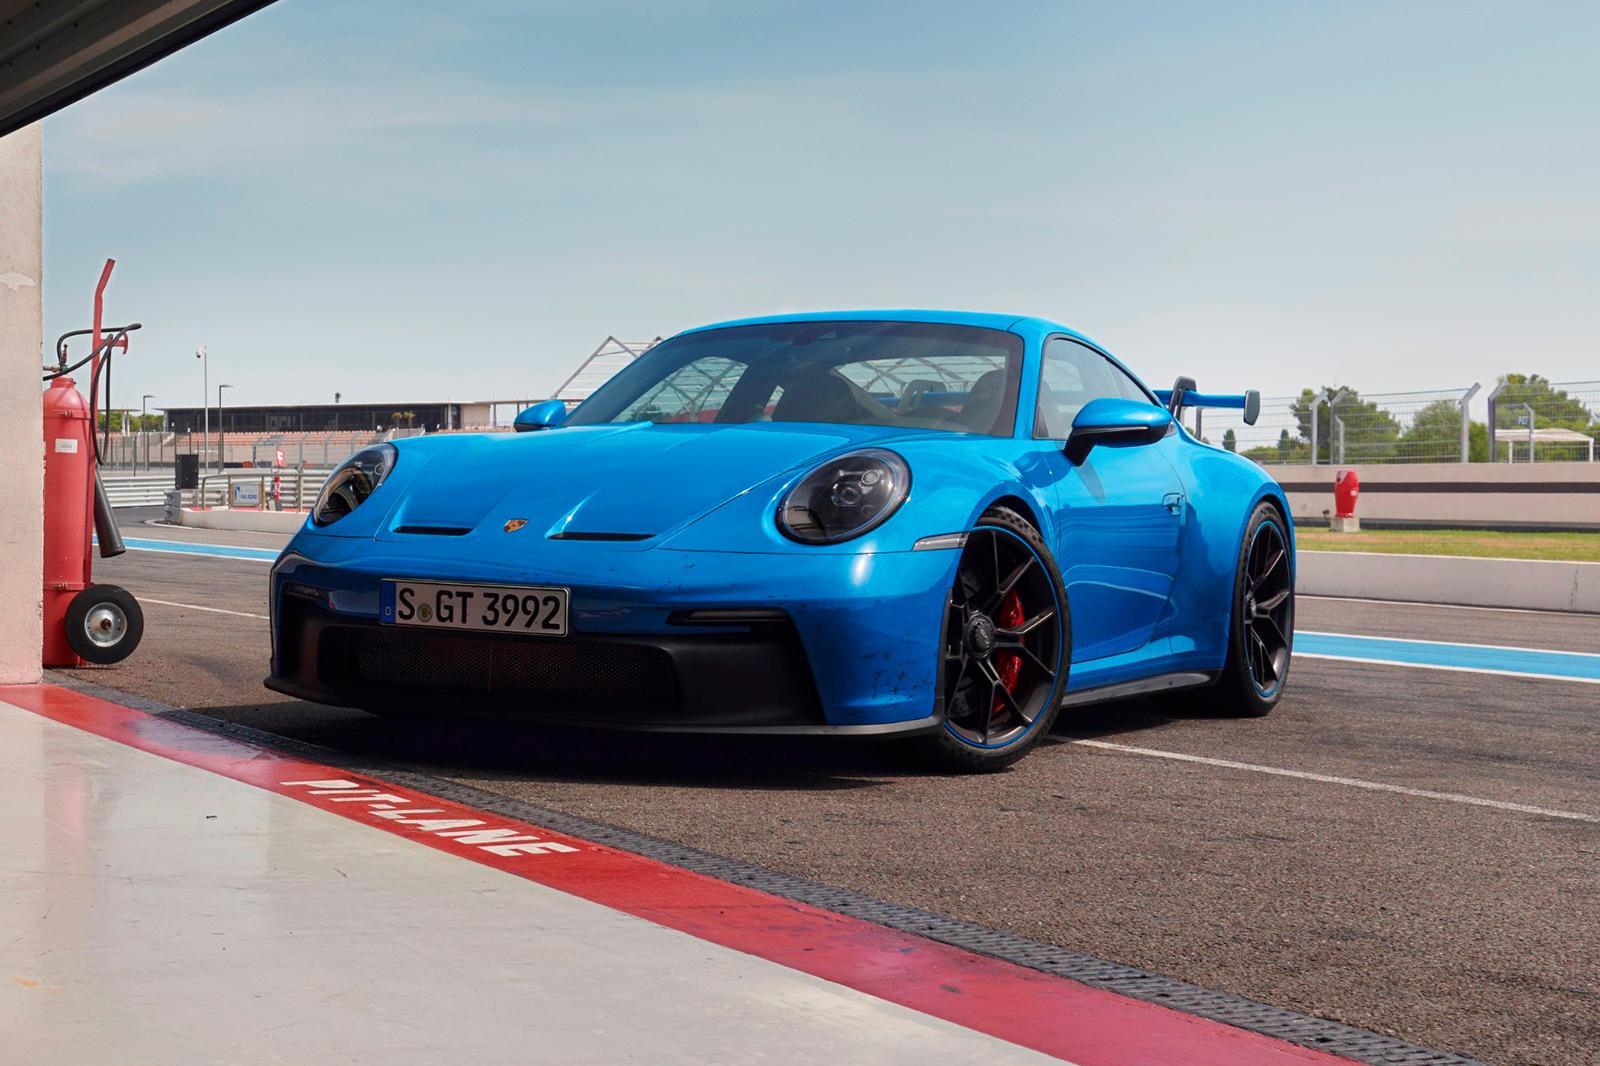 2022 Porsche 911 GT3 First Look Review: Precision Maximized